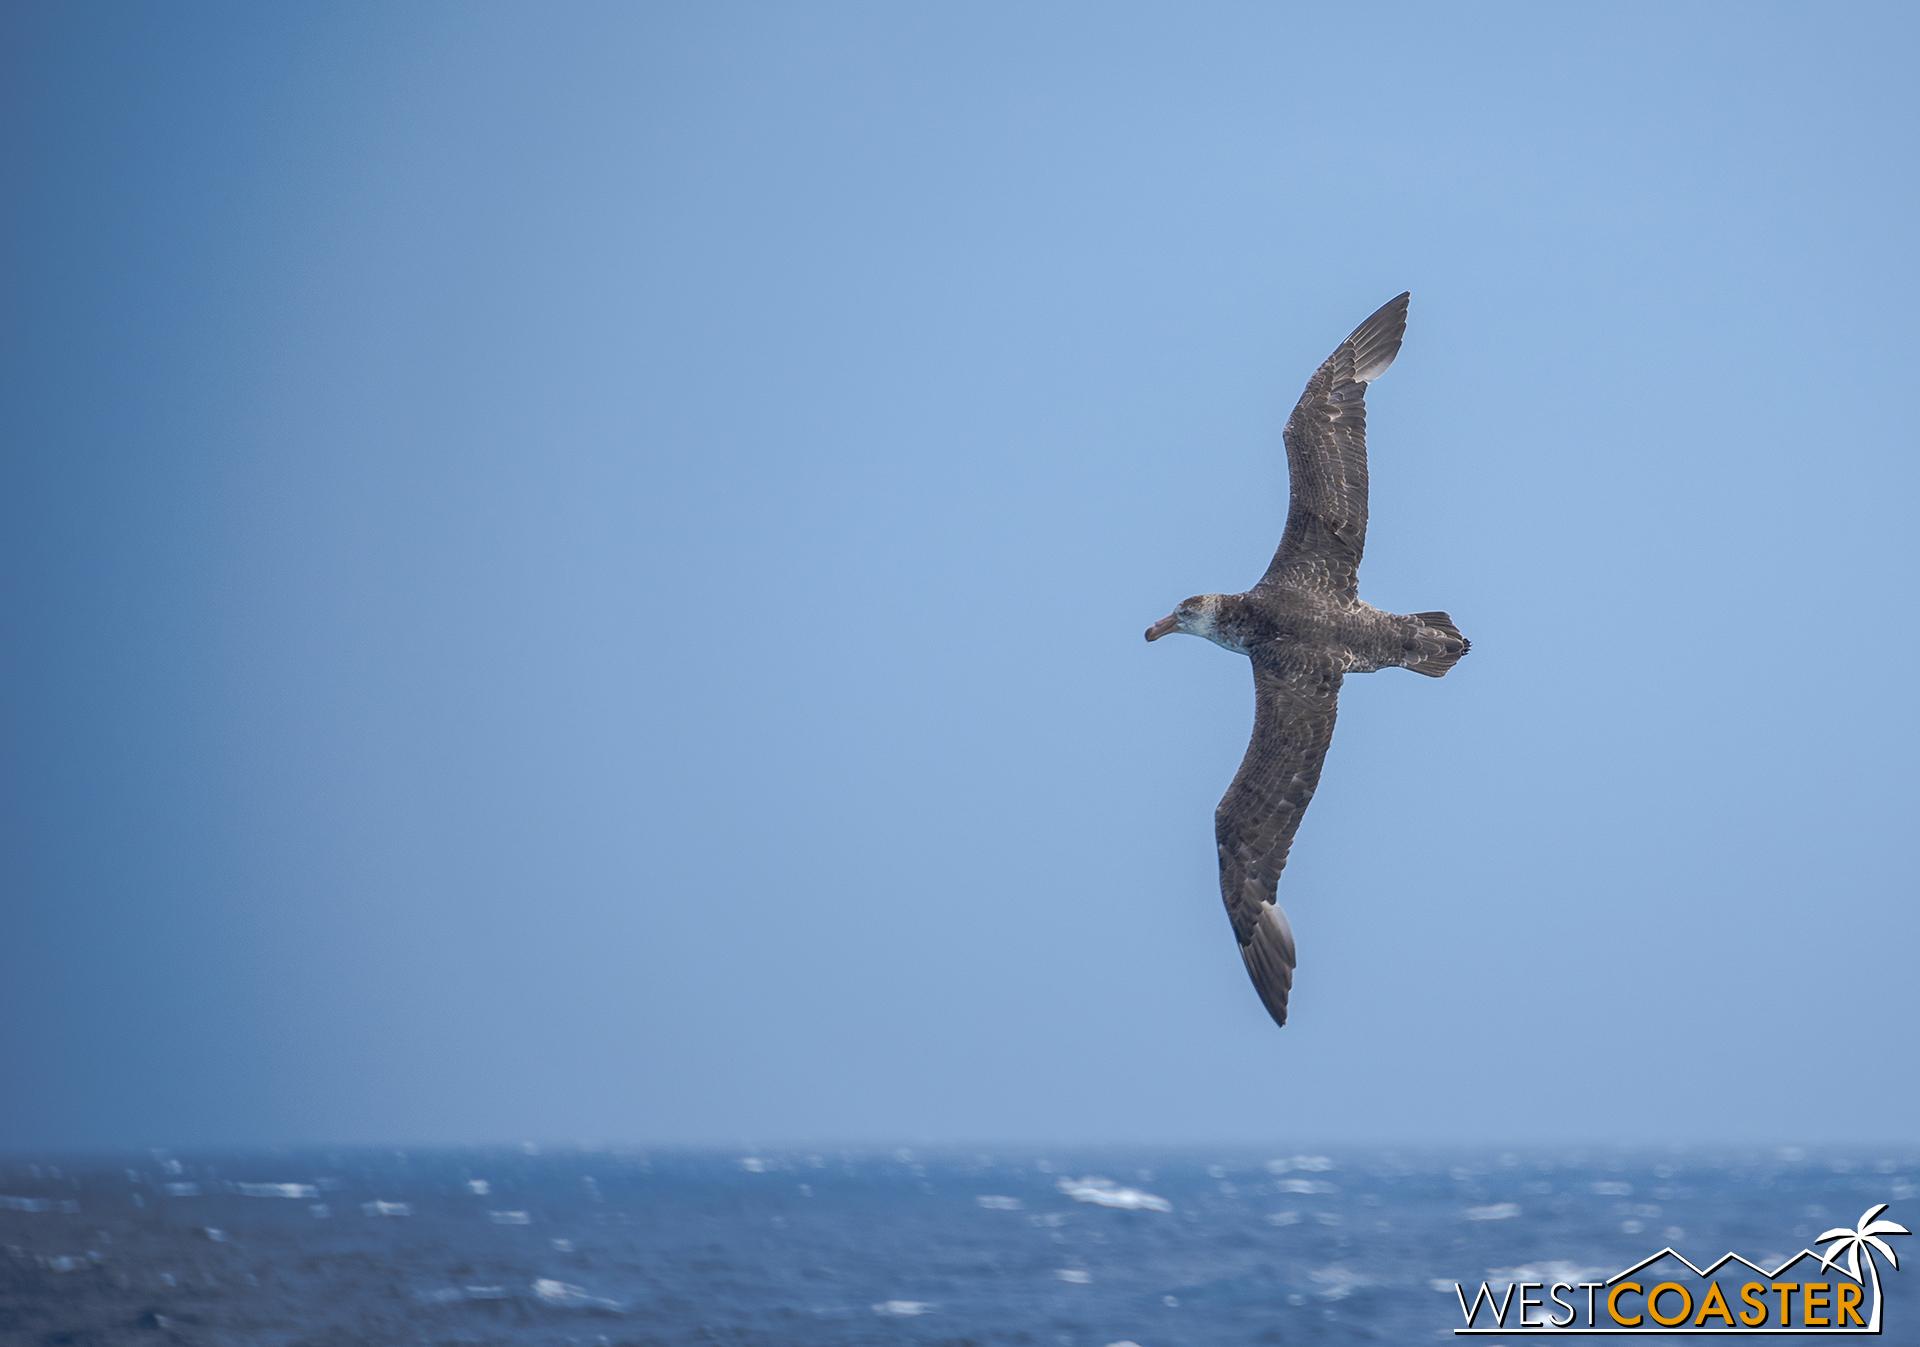 A Wandering Albatross spreads its wings over the ocean waters.